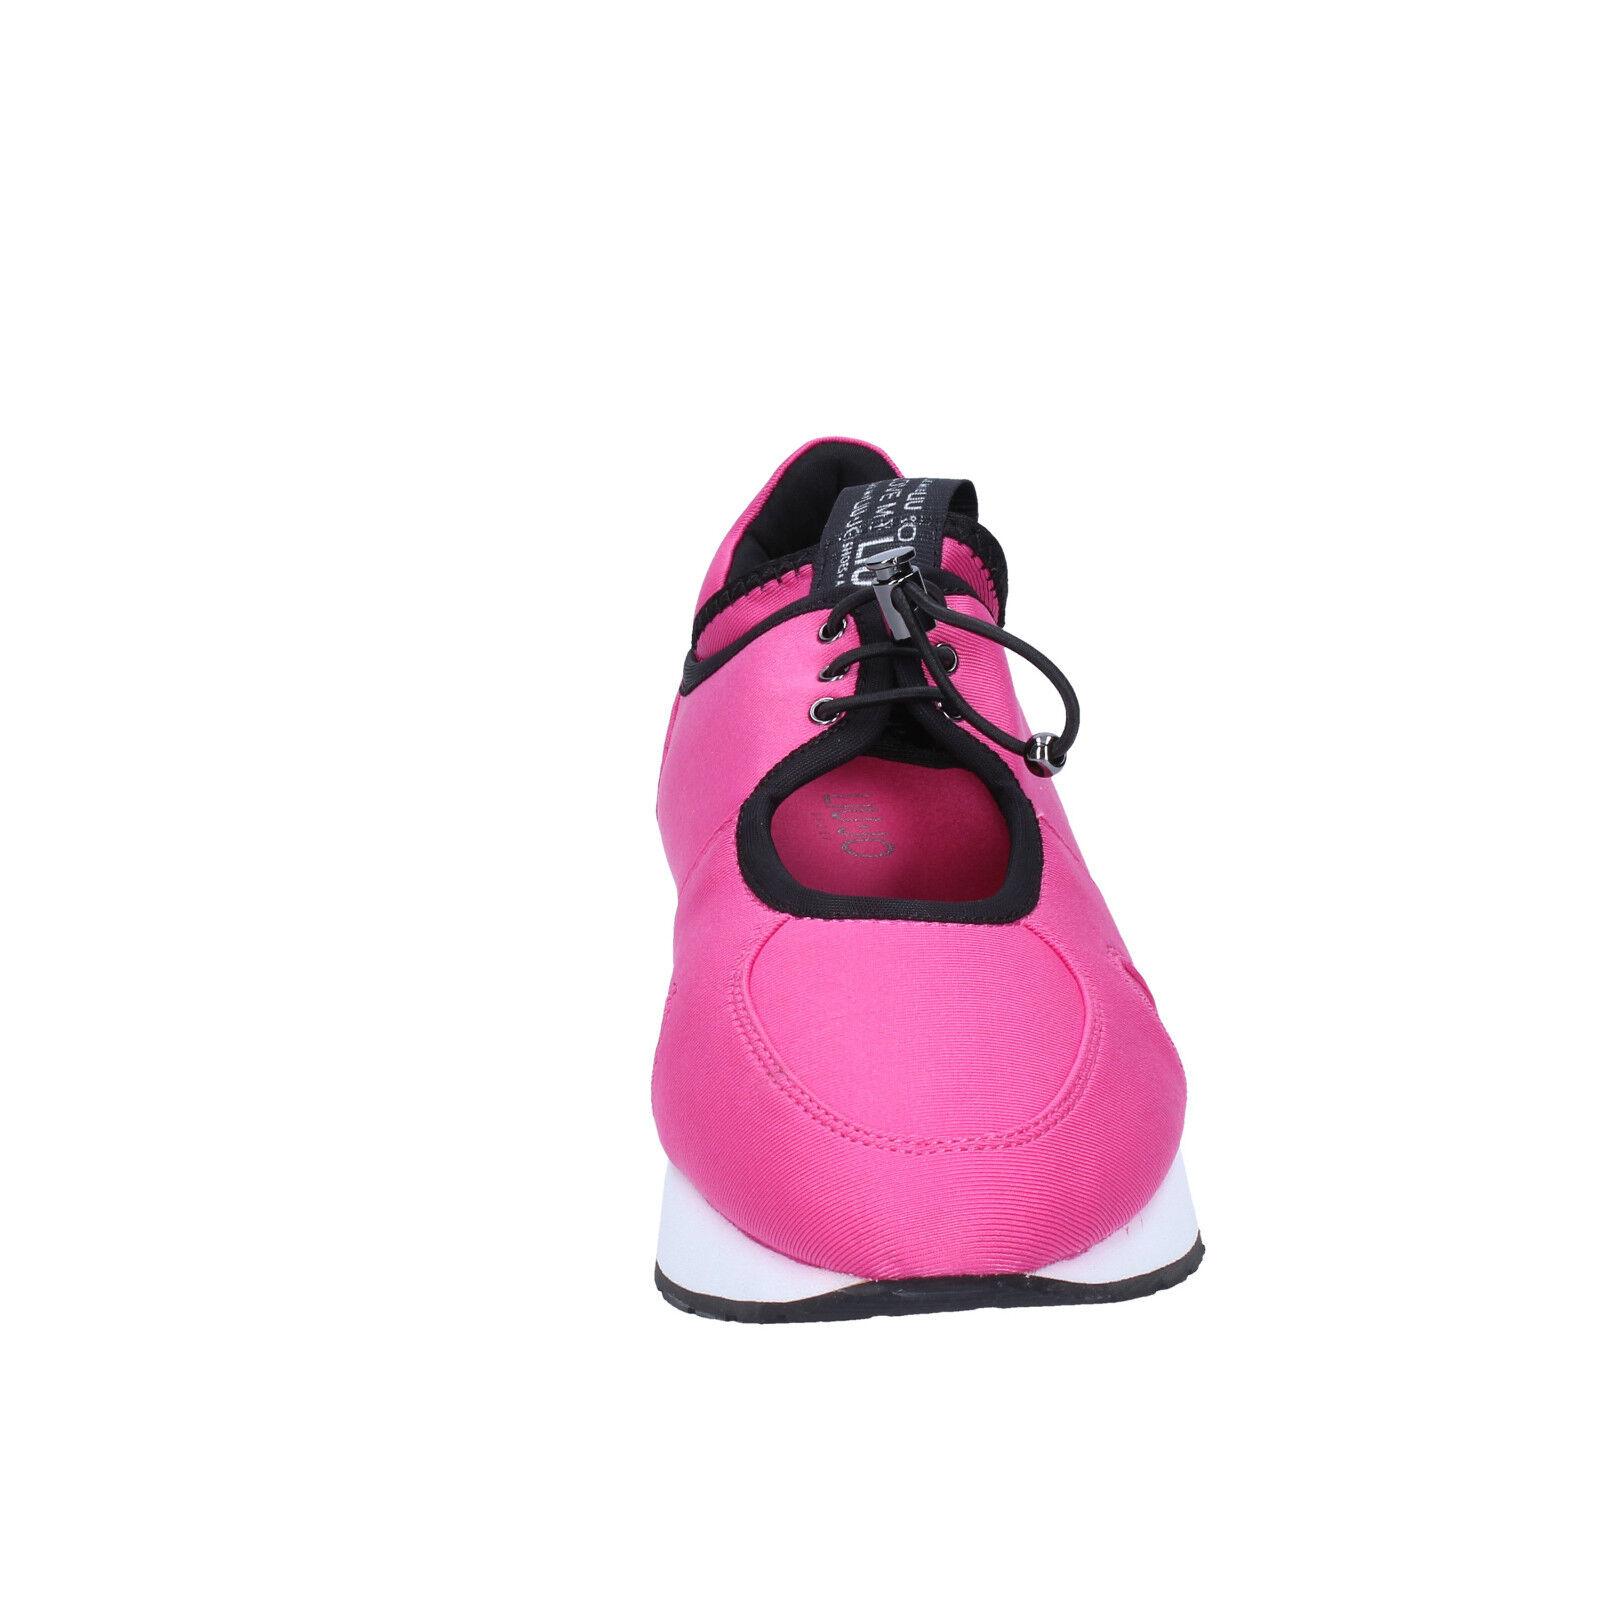 Damen schuhe LIU JO textil 38 EU sneakers fucsie textil JO BT276-38 982bbd